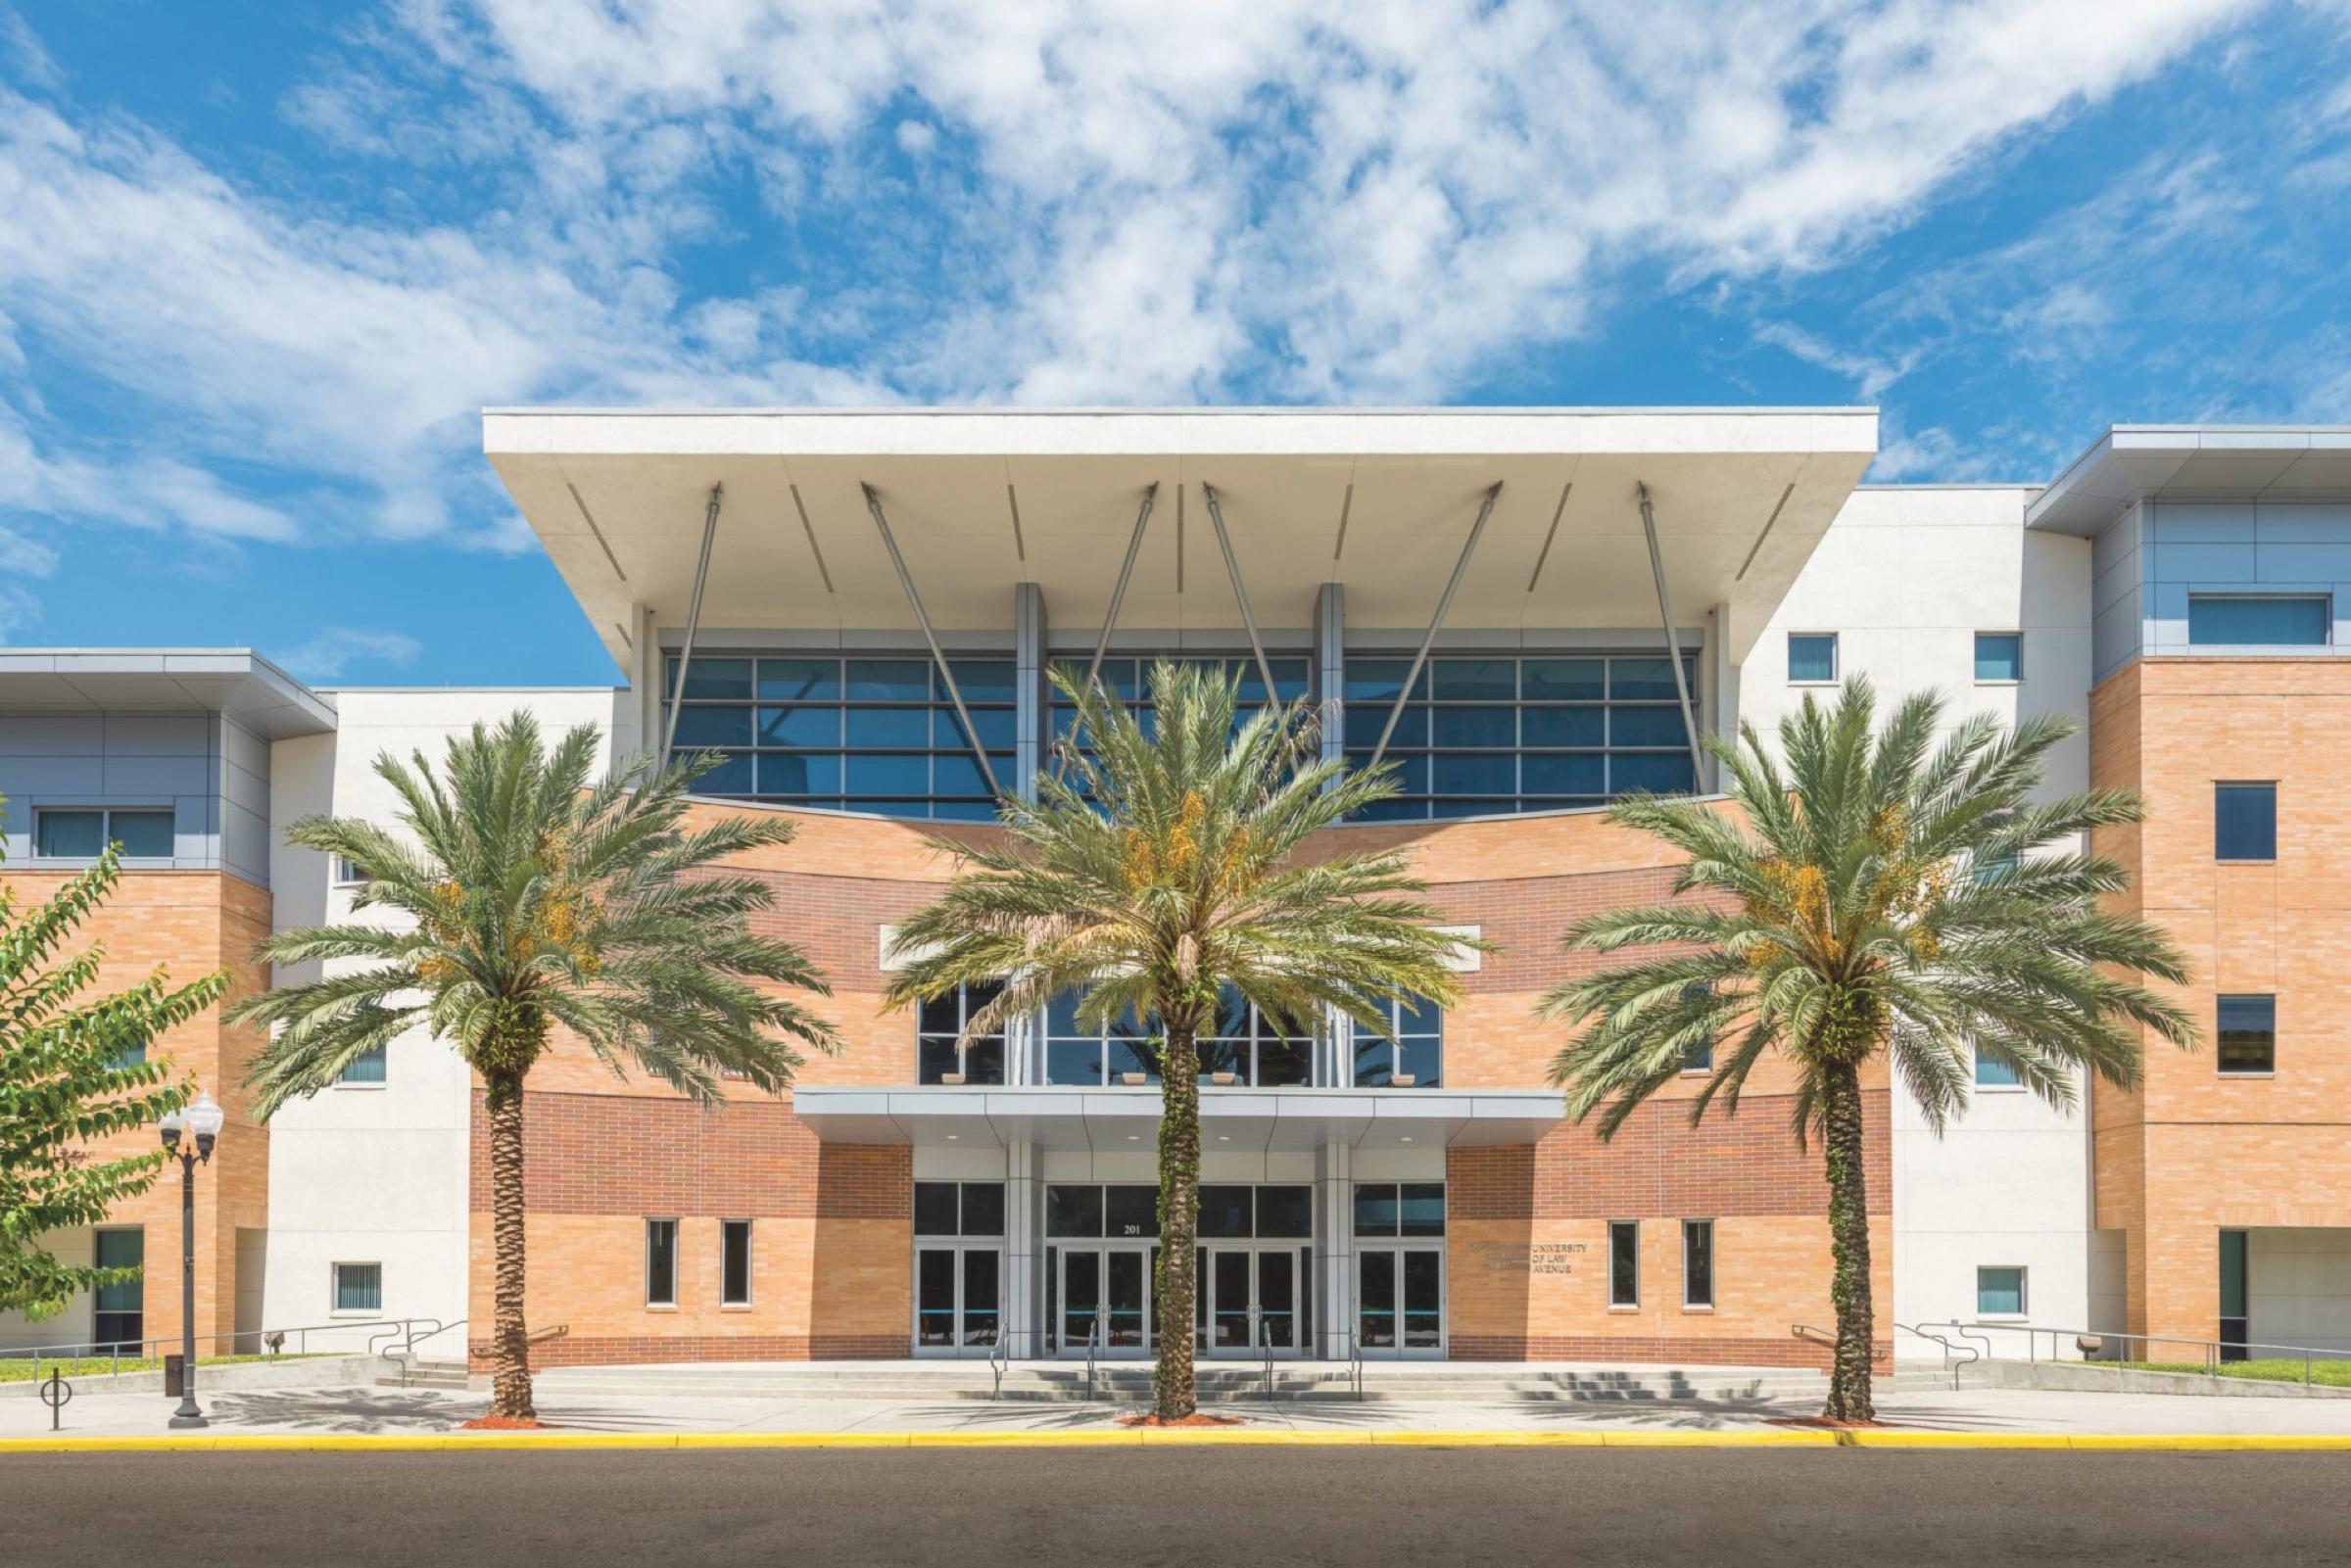 Florida A&M University (FAMU) College of Law